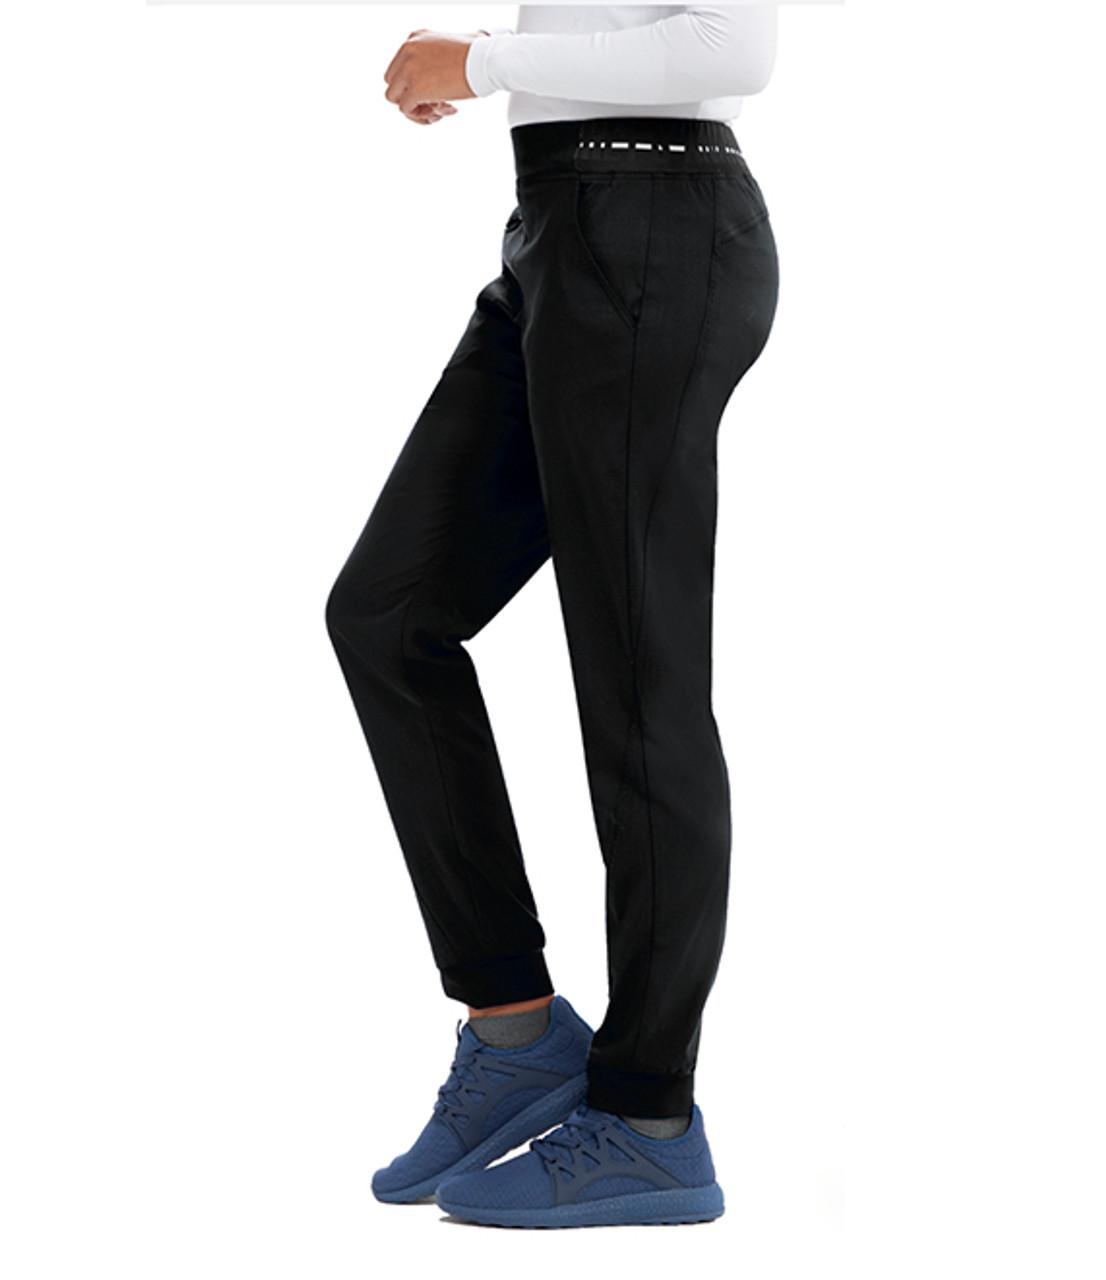 (GVSP512) Grey's Anatomy Spandex Stretch 3 Pocket Jogger Pants